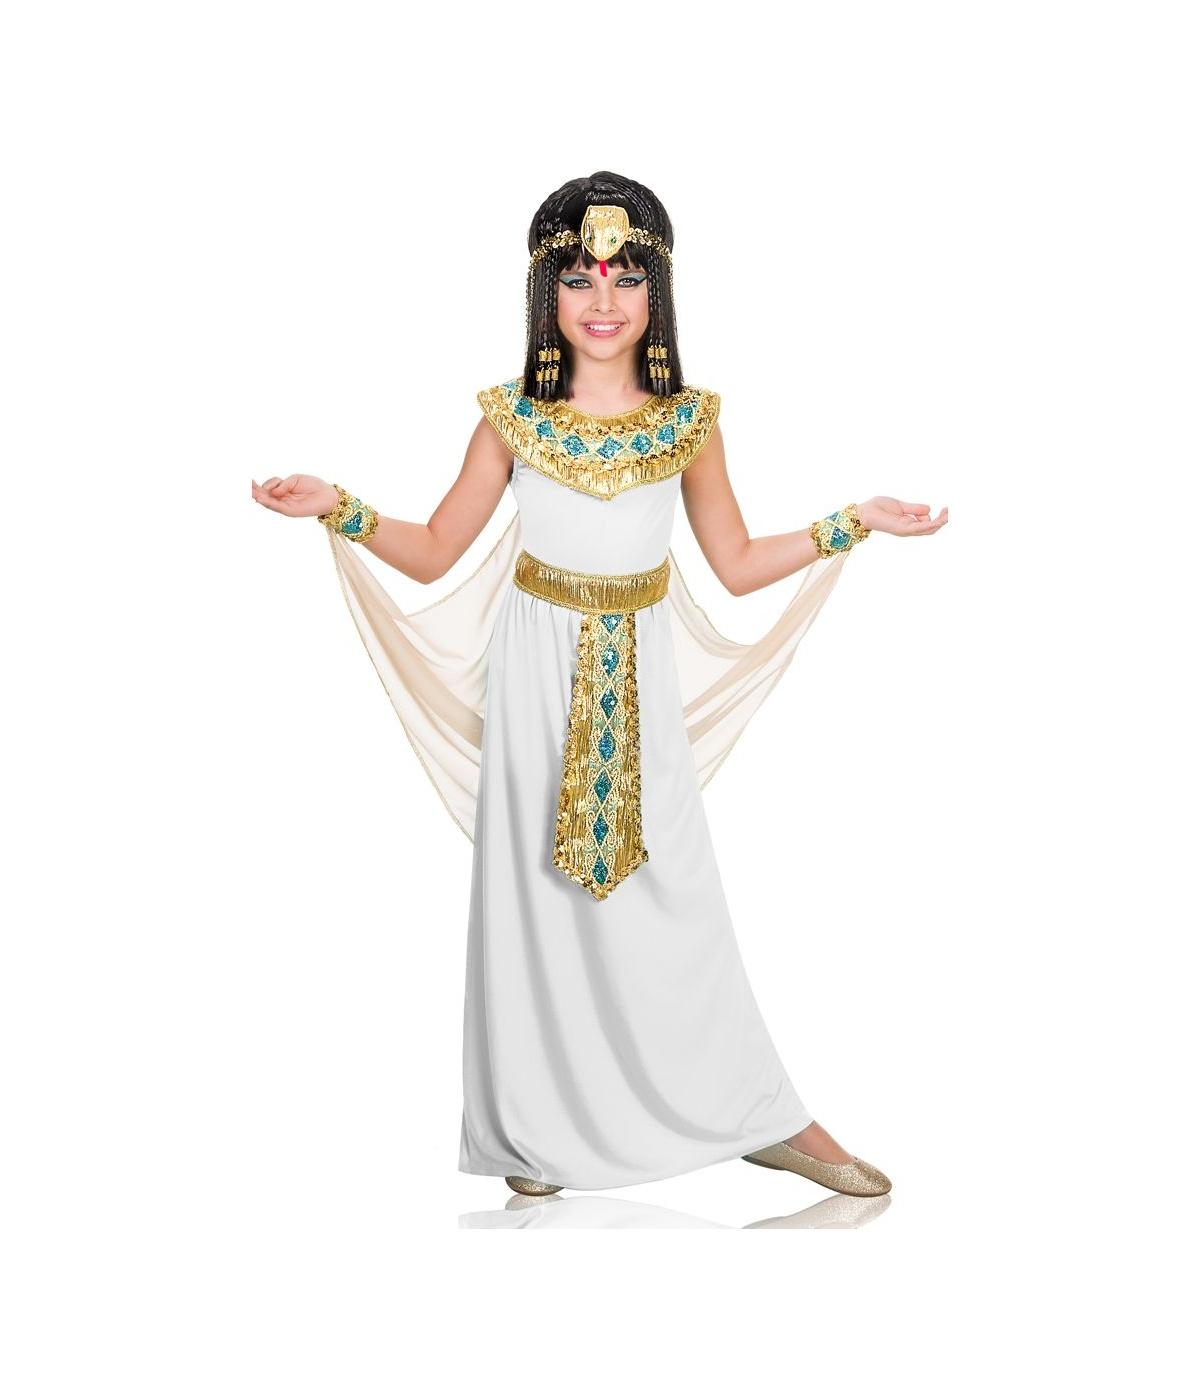 Cleopatra Pharaoh of Egypt Girls Costume - Egyptian Costumes